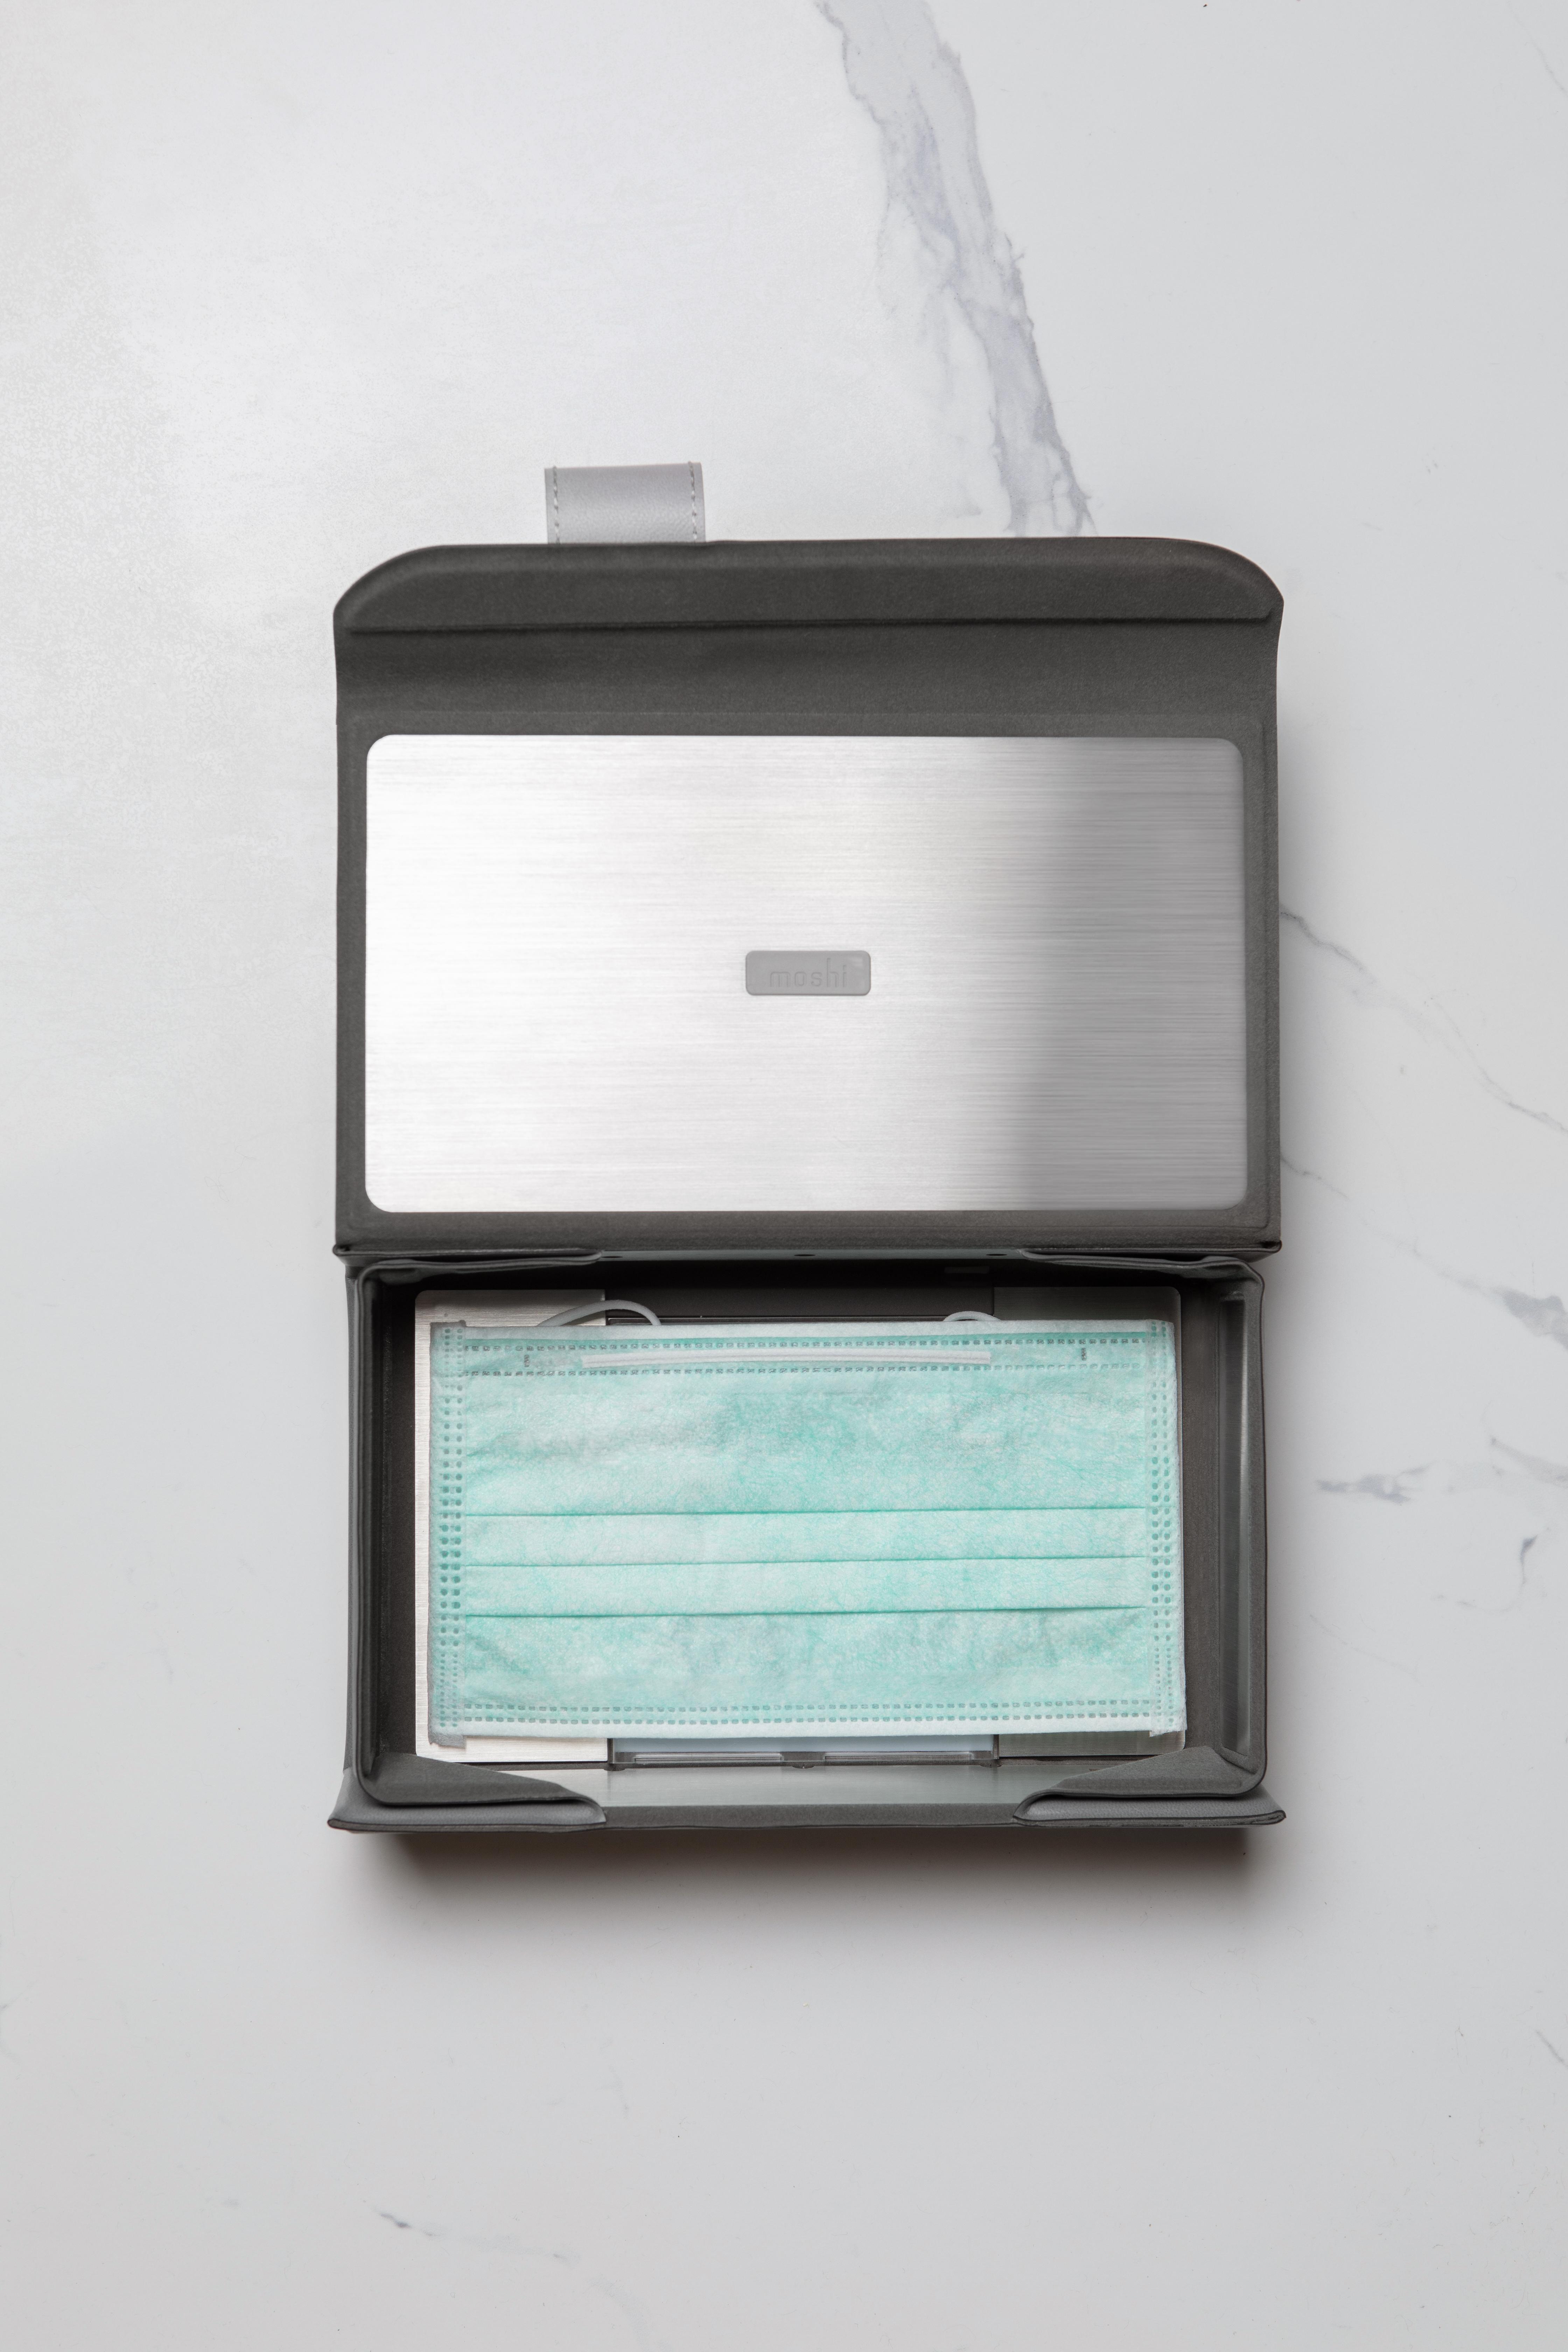 A disposable surgical mask inside a Moshi Deep Purple UV sanitizer